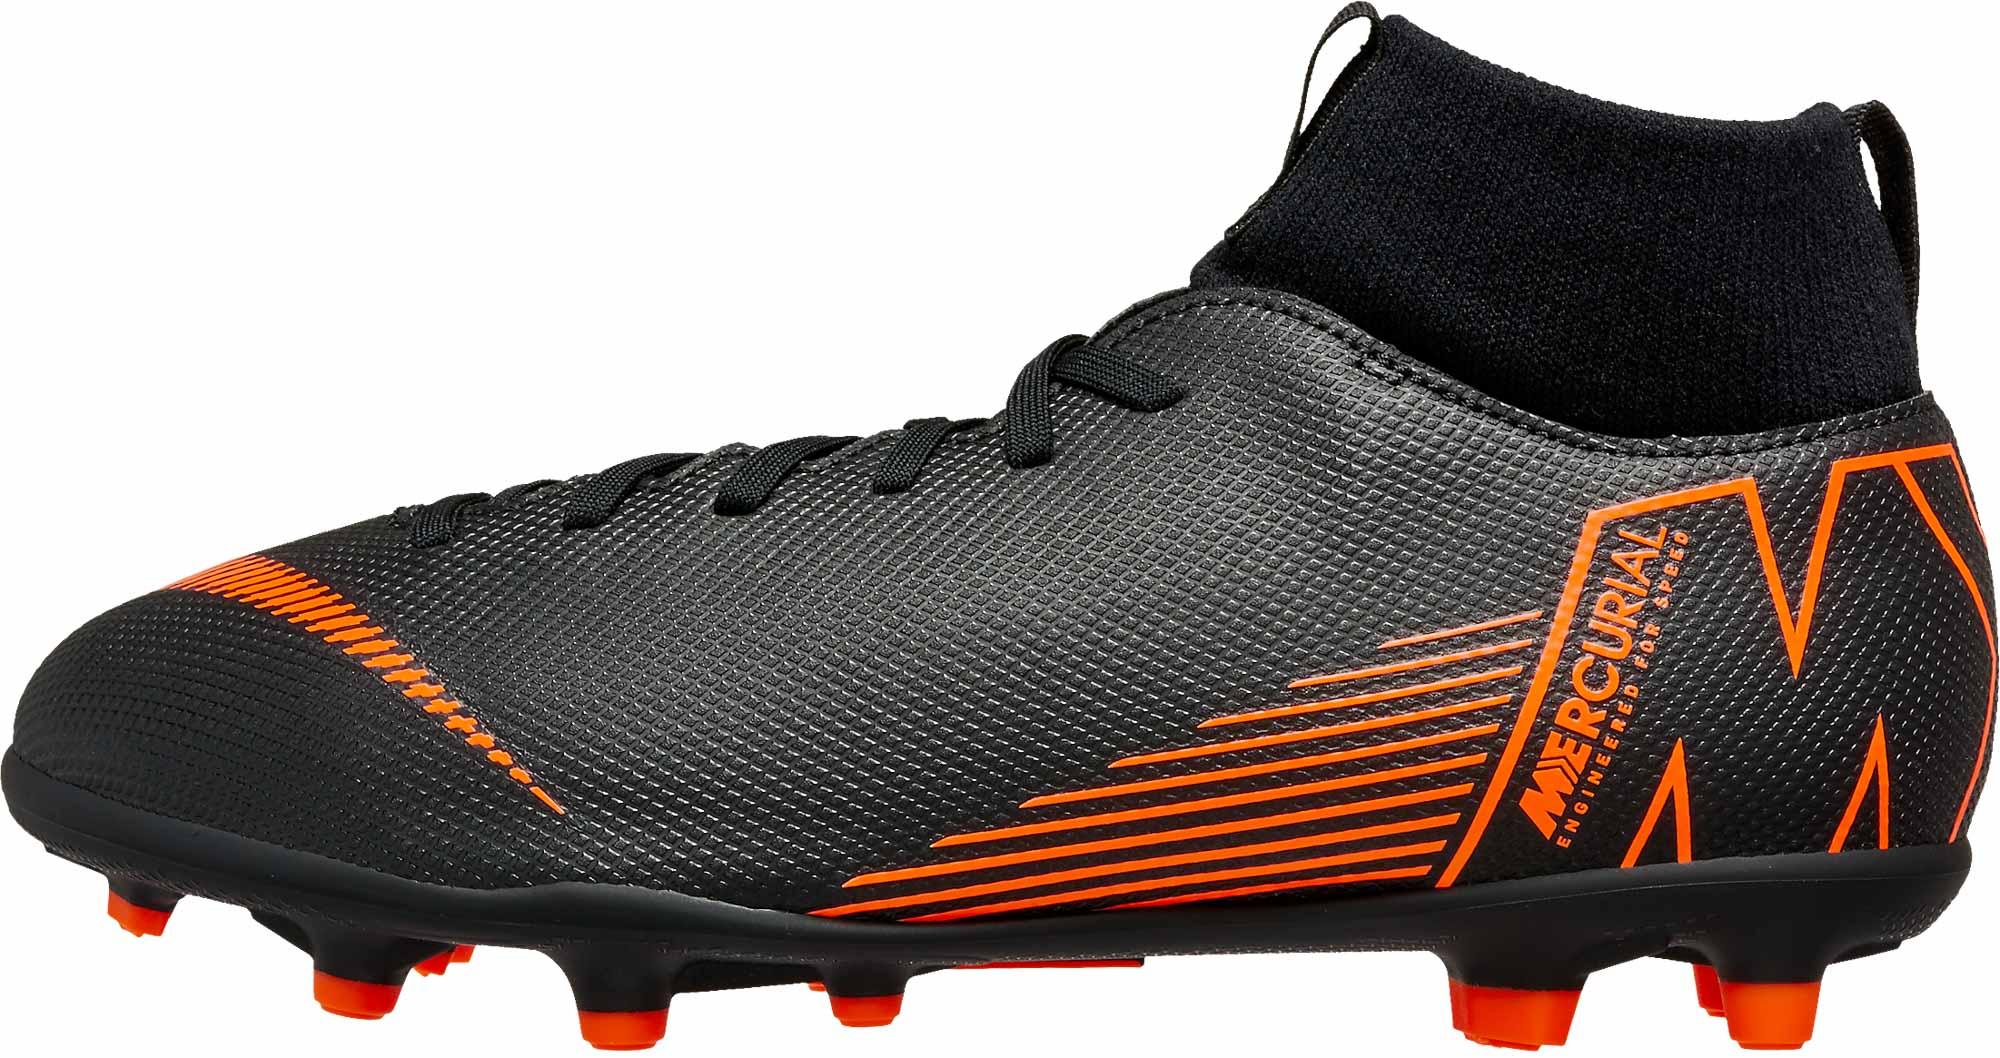 Nike Orange And Black Soccer Shoes